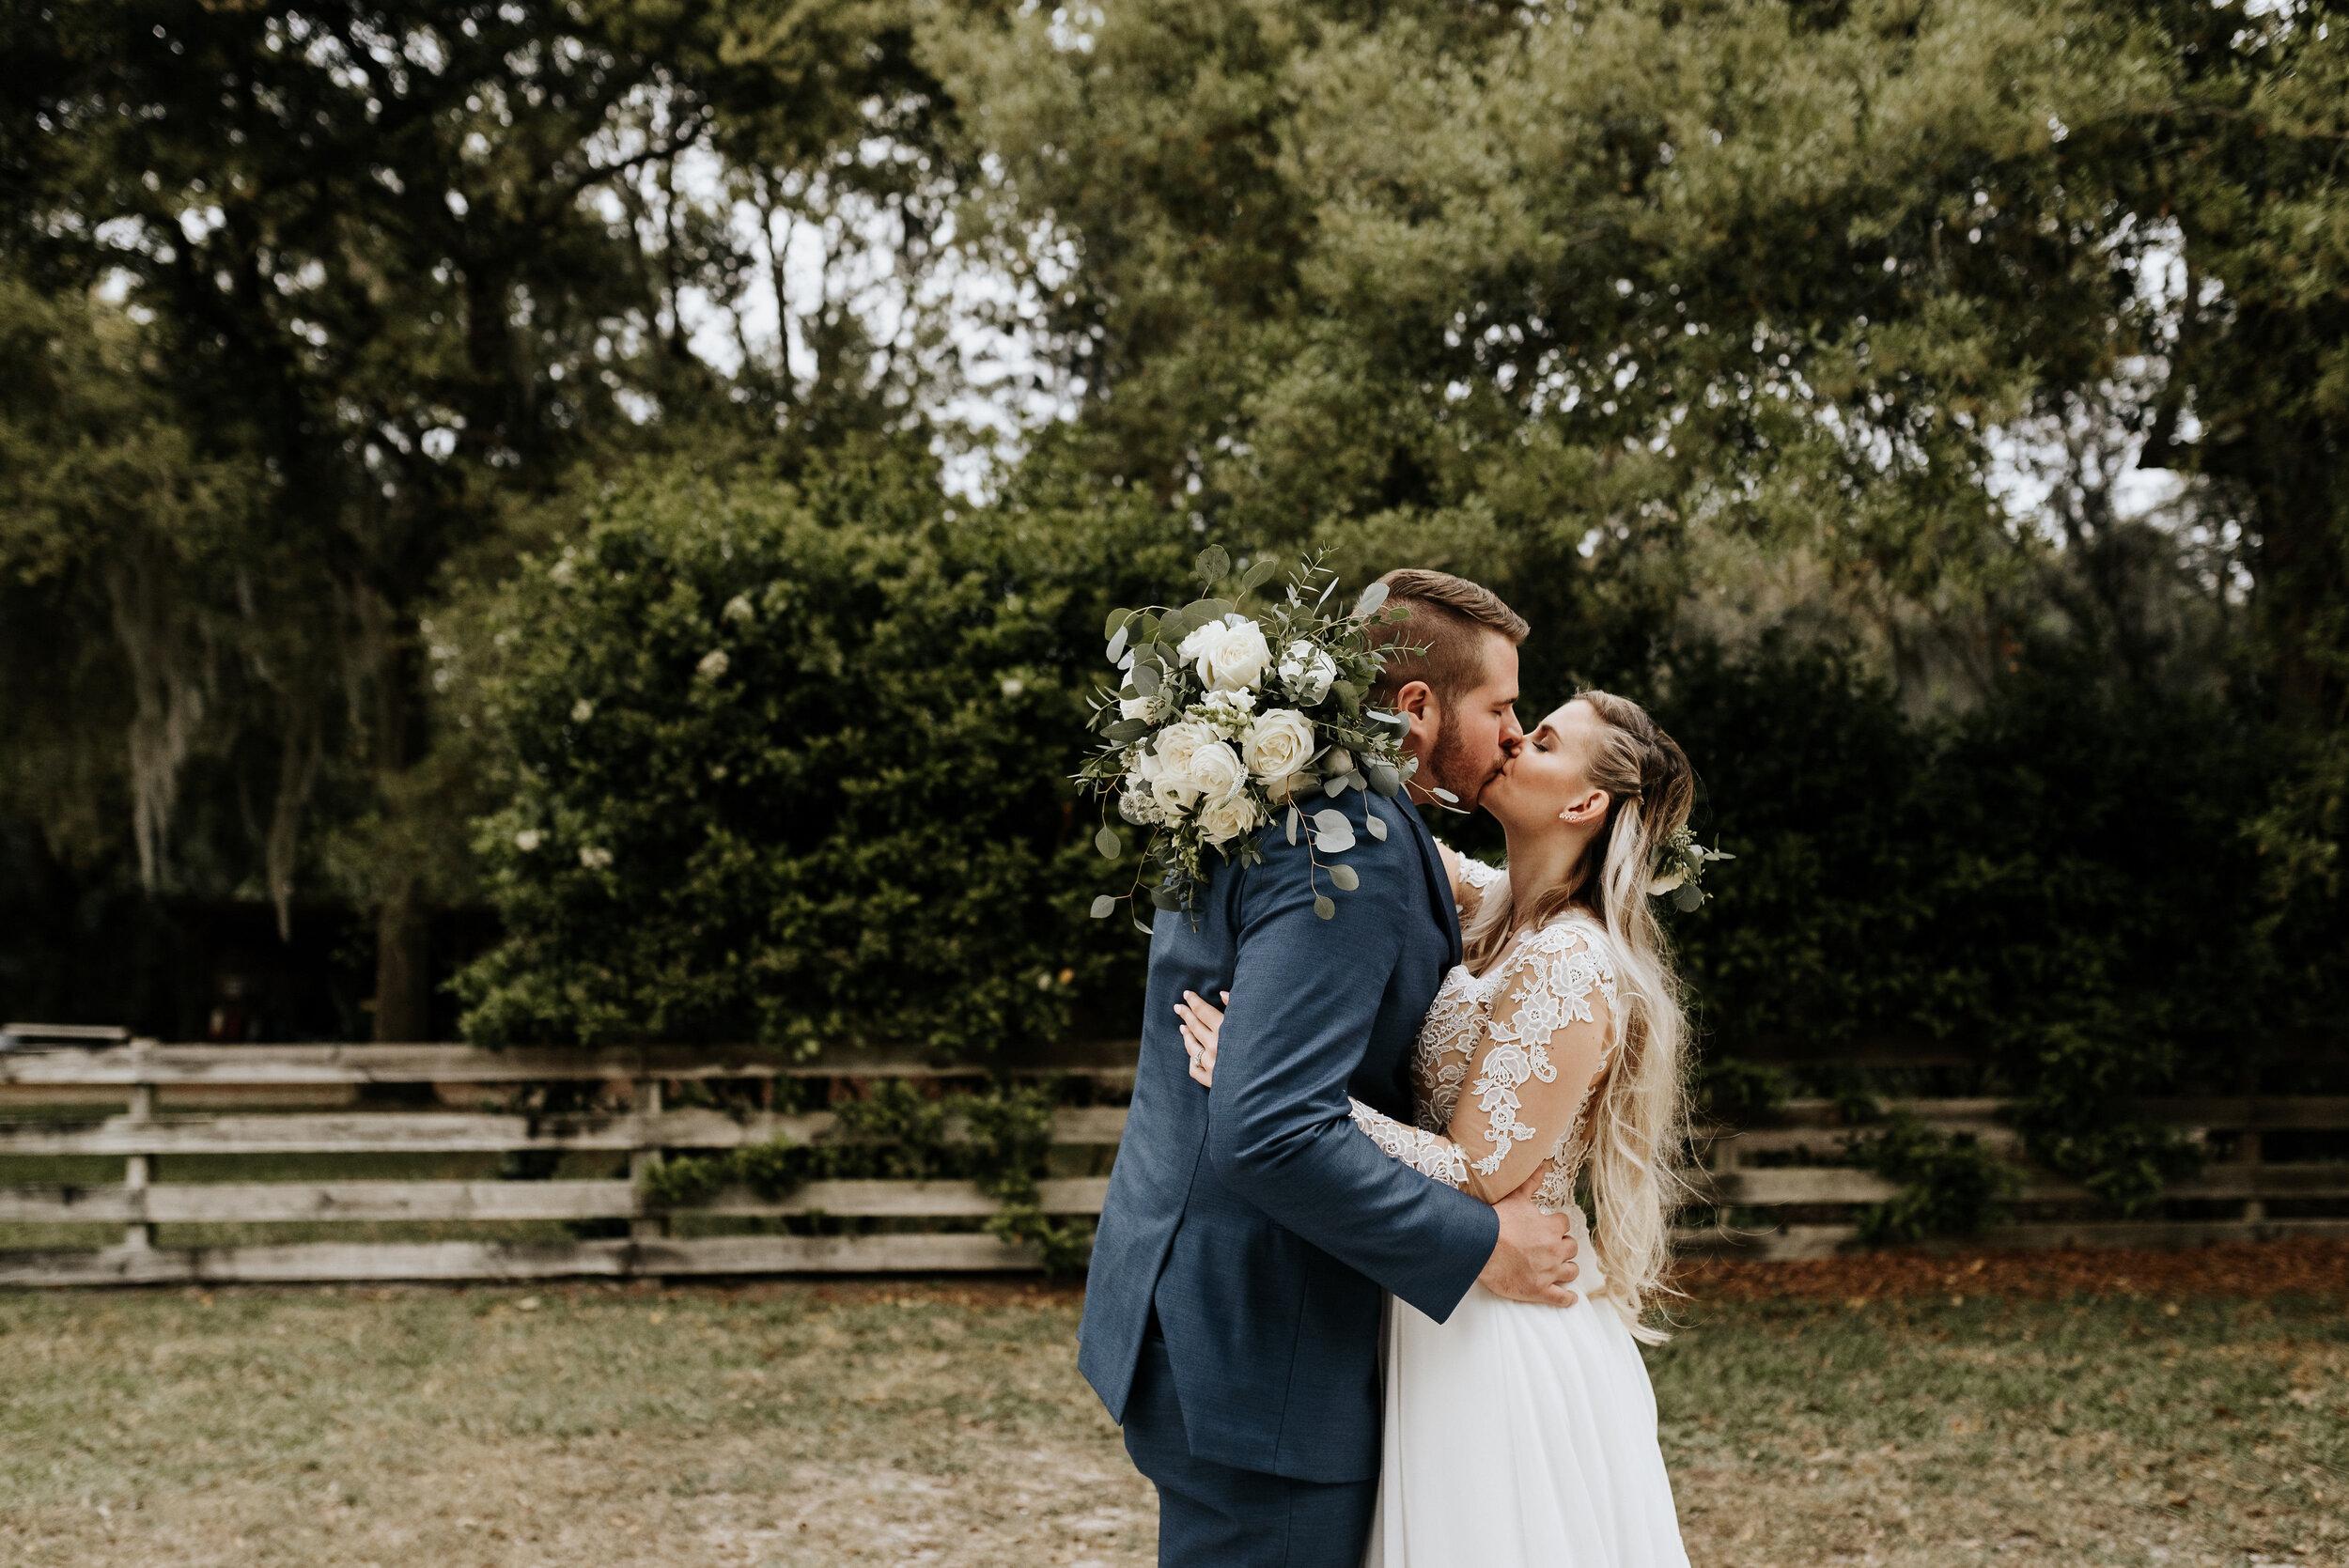 Mikenzi_Brad_Wedding_The_Delamater_House_New_Smyrna_Beach_Florida_Photography_by_V_0907.jpg